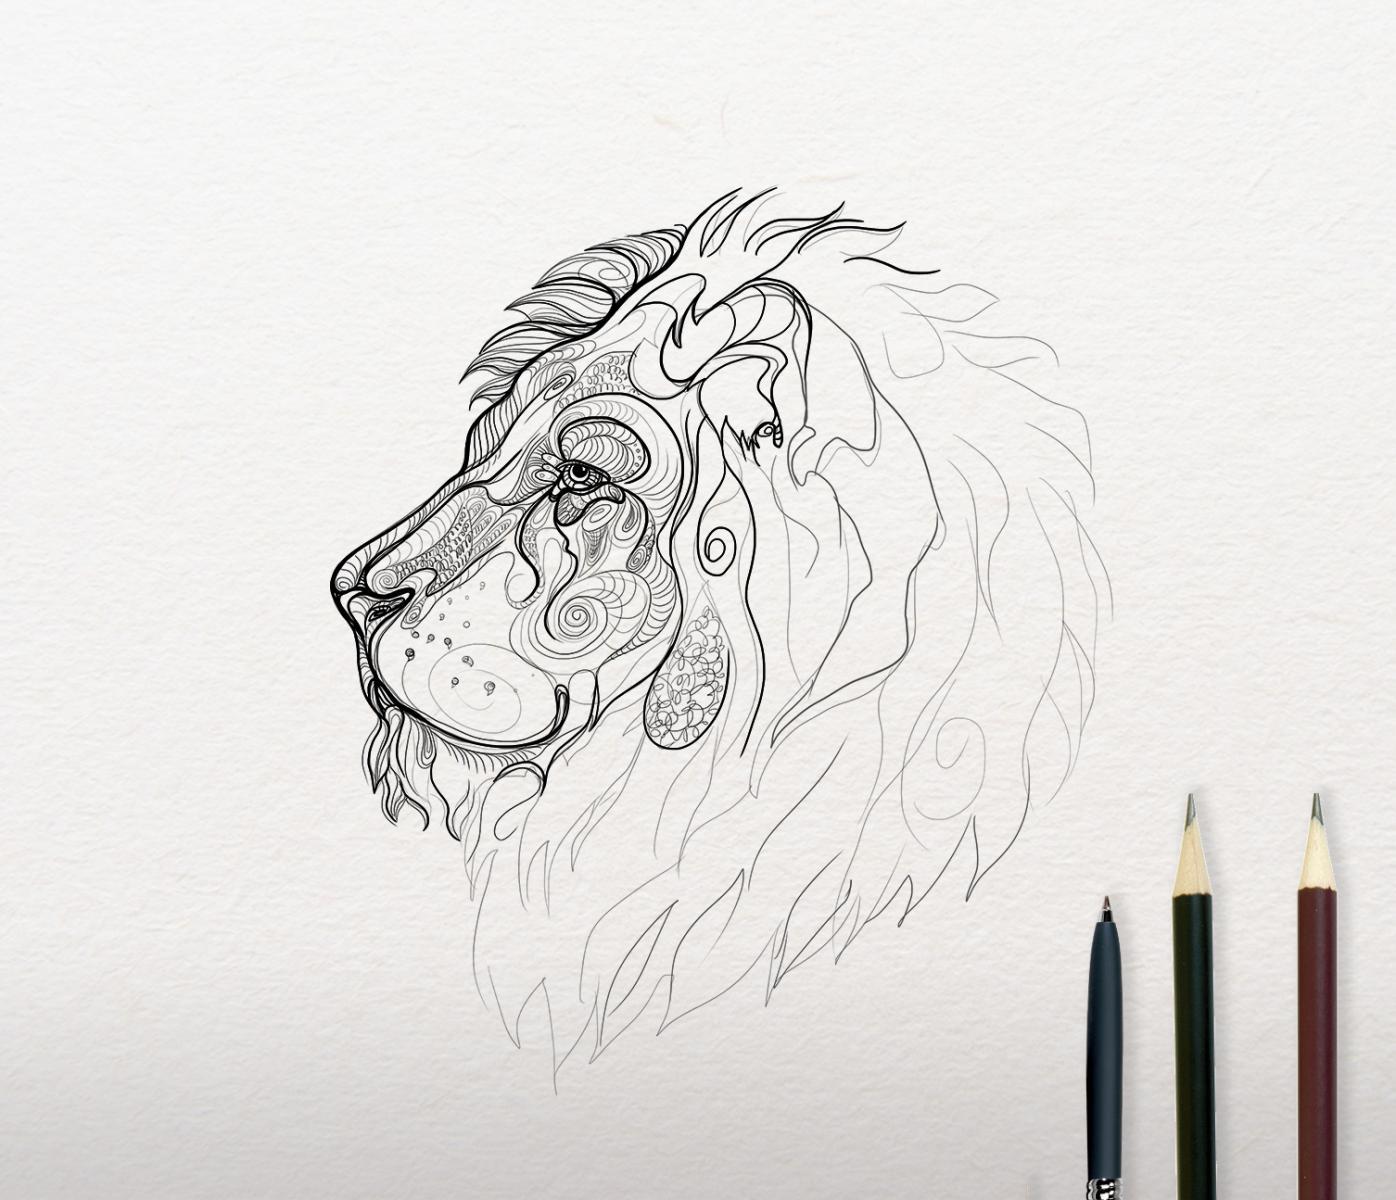 Lion sketch embroidery design